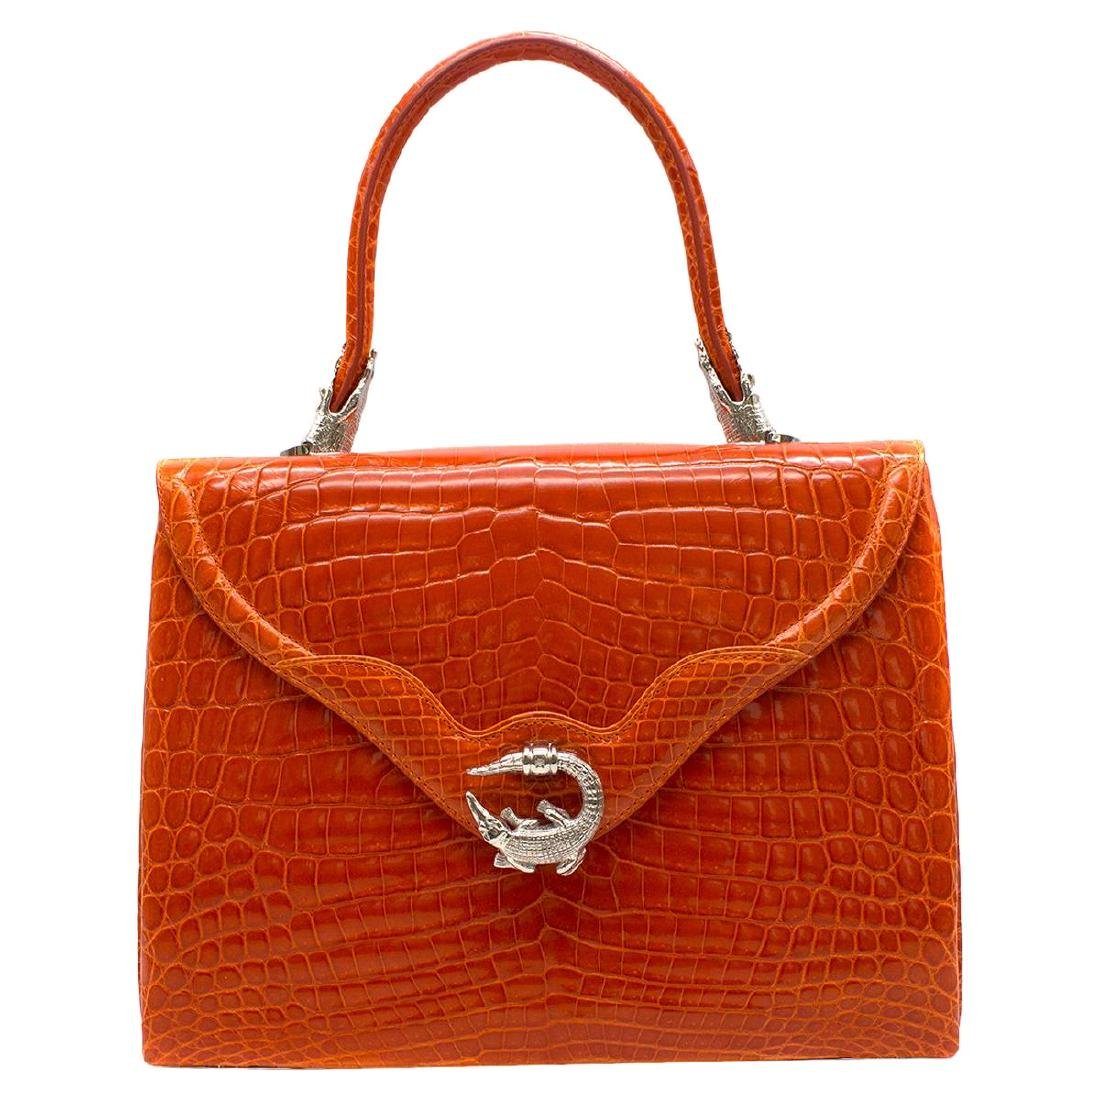 Kwanpen Orange Crocodile Leather 5568 Signature Handbag